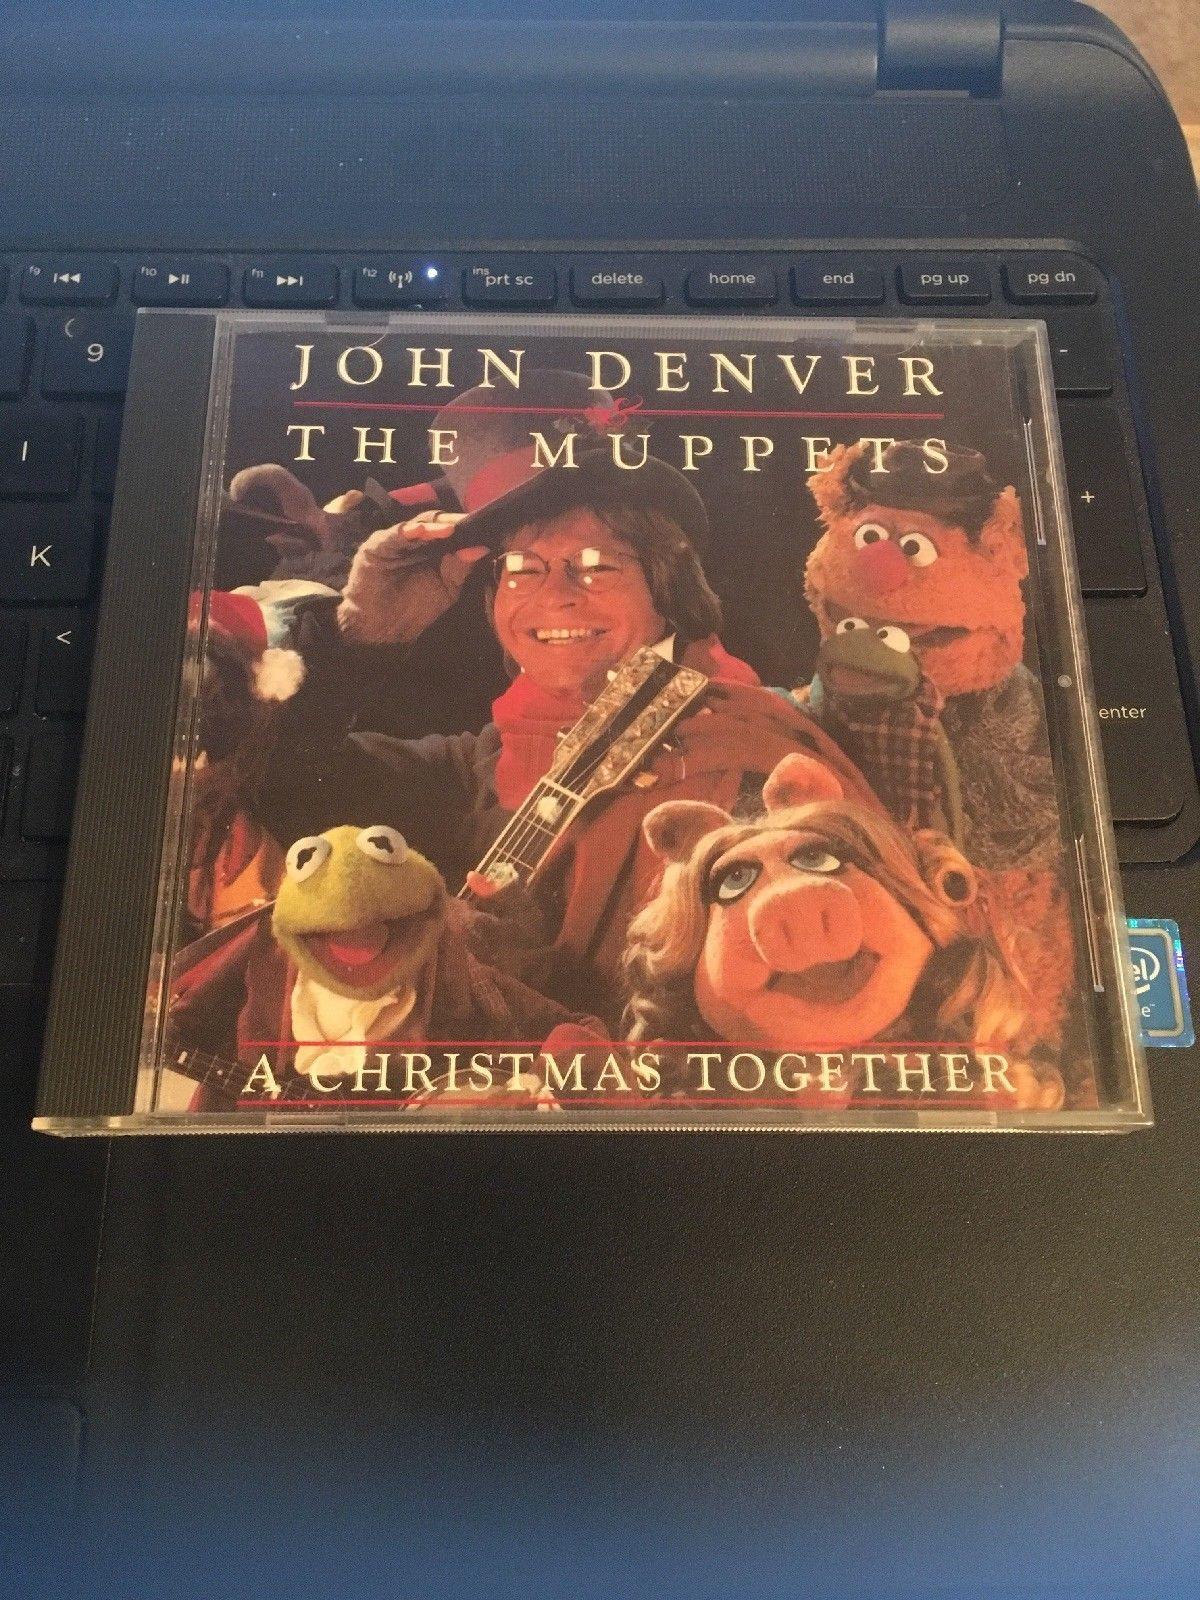 John Denver The Muppets A Christmas Together | Etsy